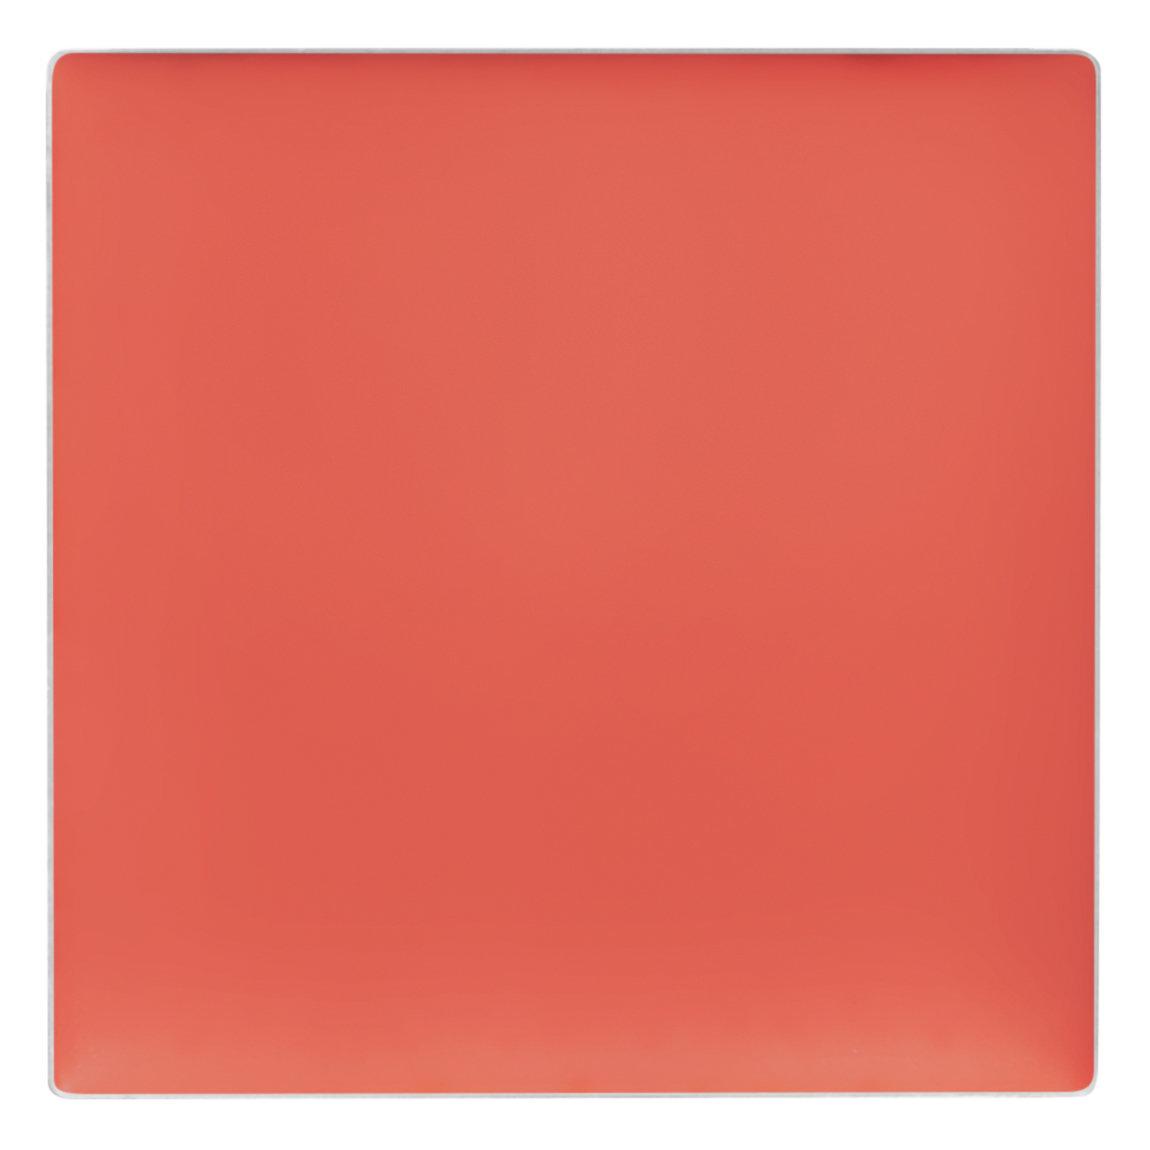 Kjaer Weis Cream Blush Refill Joyful alternative view 1 - product swatch.